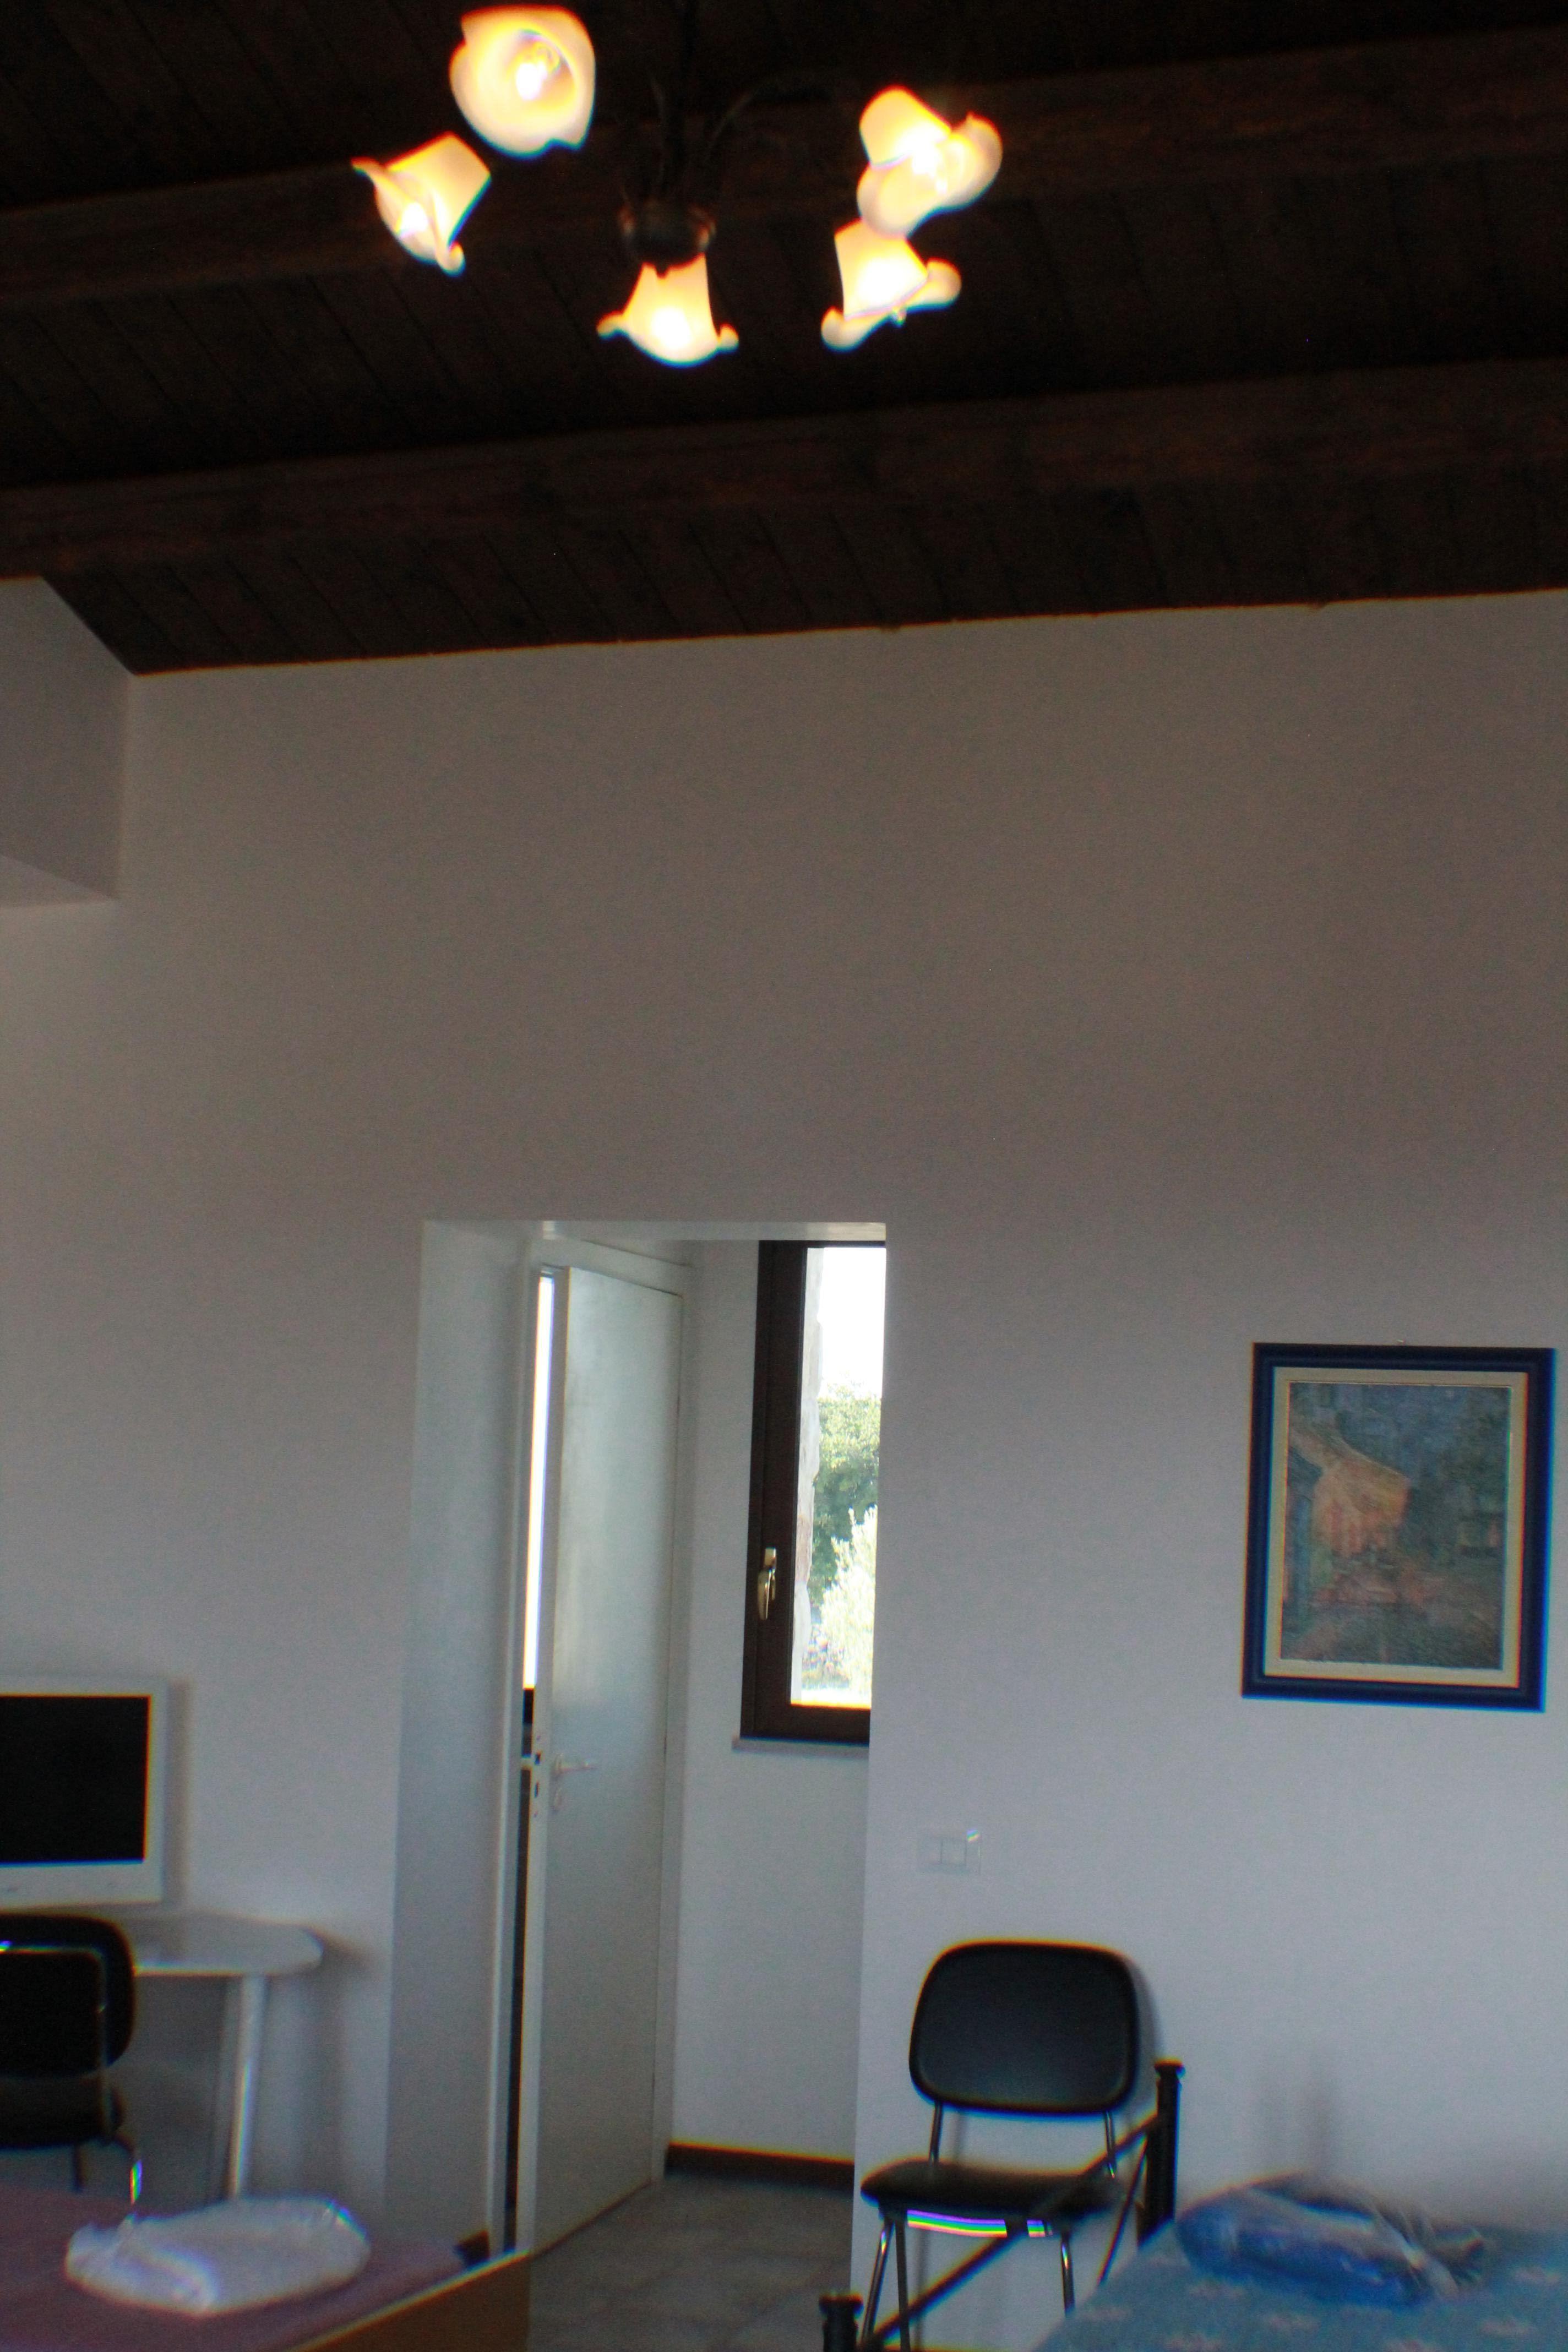 Appartement de vacances Agriturismo Le Due Palme - Das Paradies Von Adamo (2506981), Modica, Ragusa, Sicile, Italie, image 12